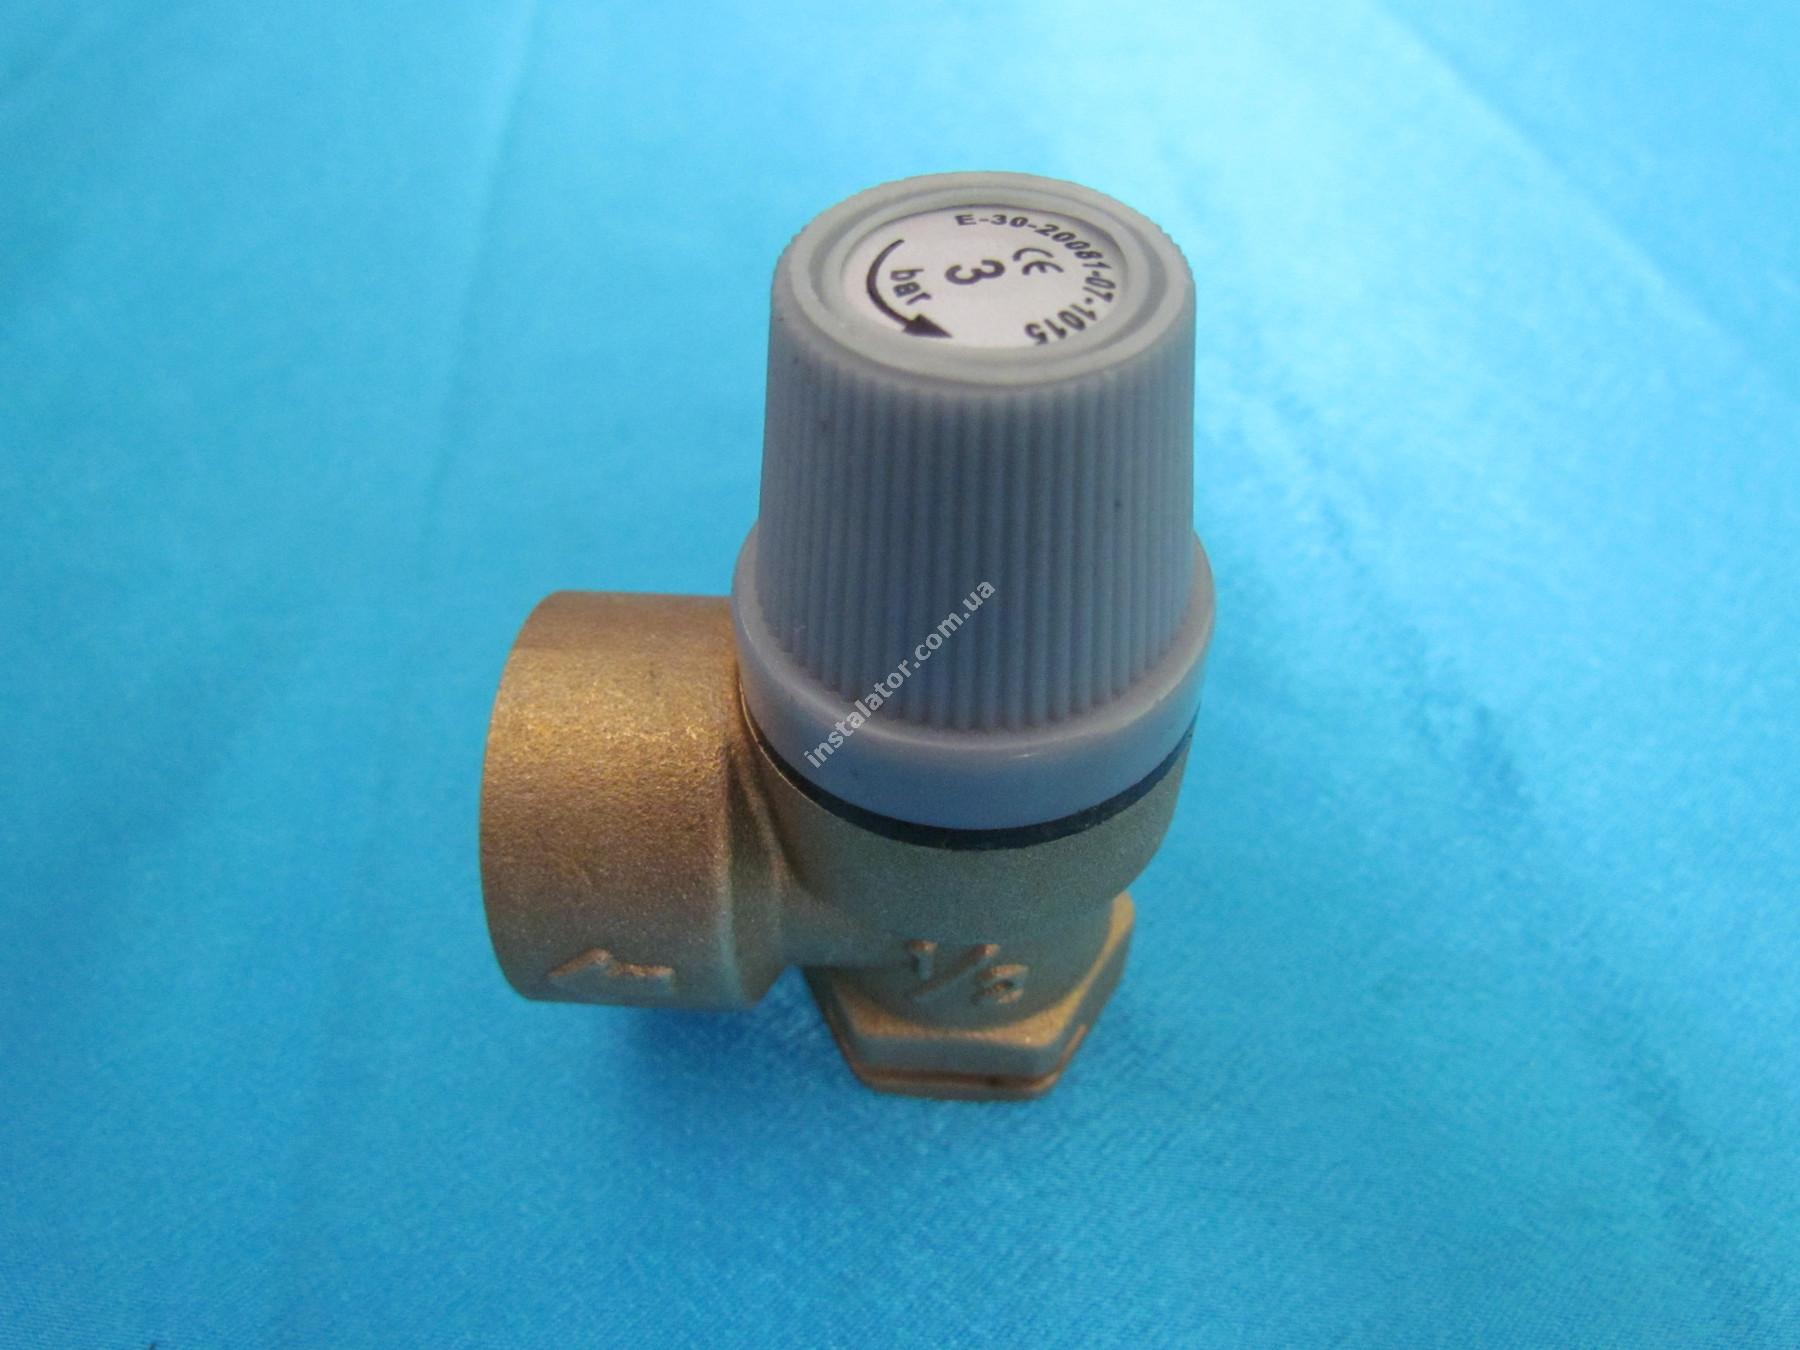 190732 Запобіжний клапан  VAILLANT Pro/Plus 3 bar full-image-2